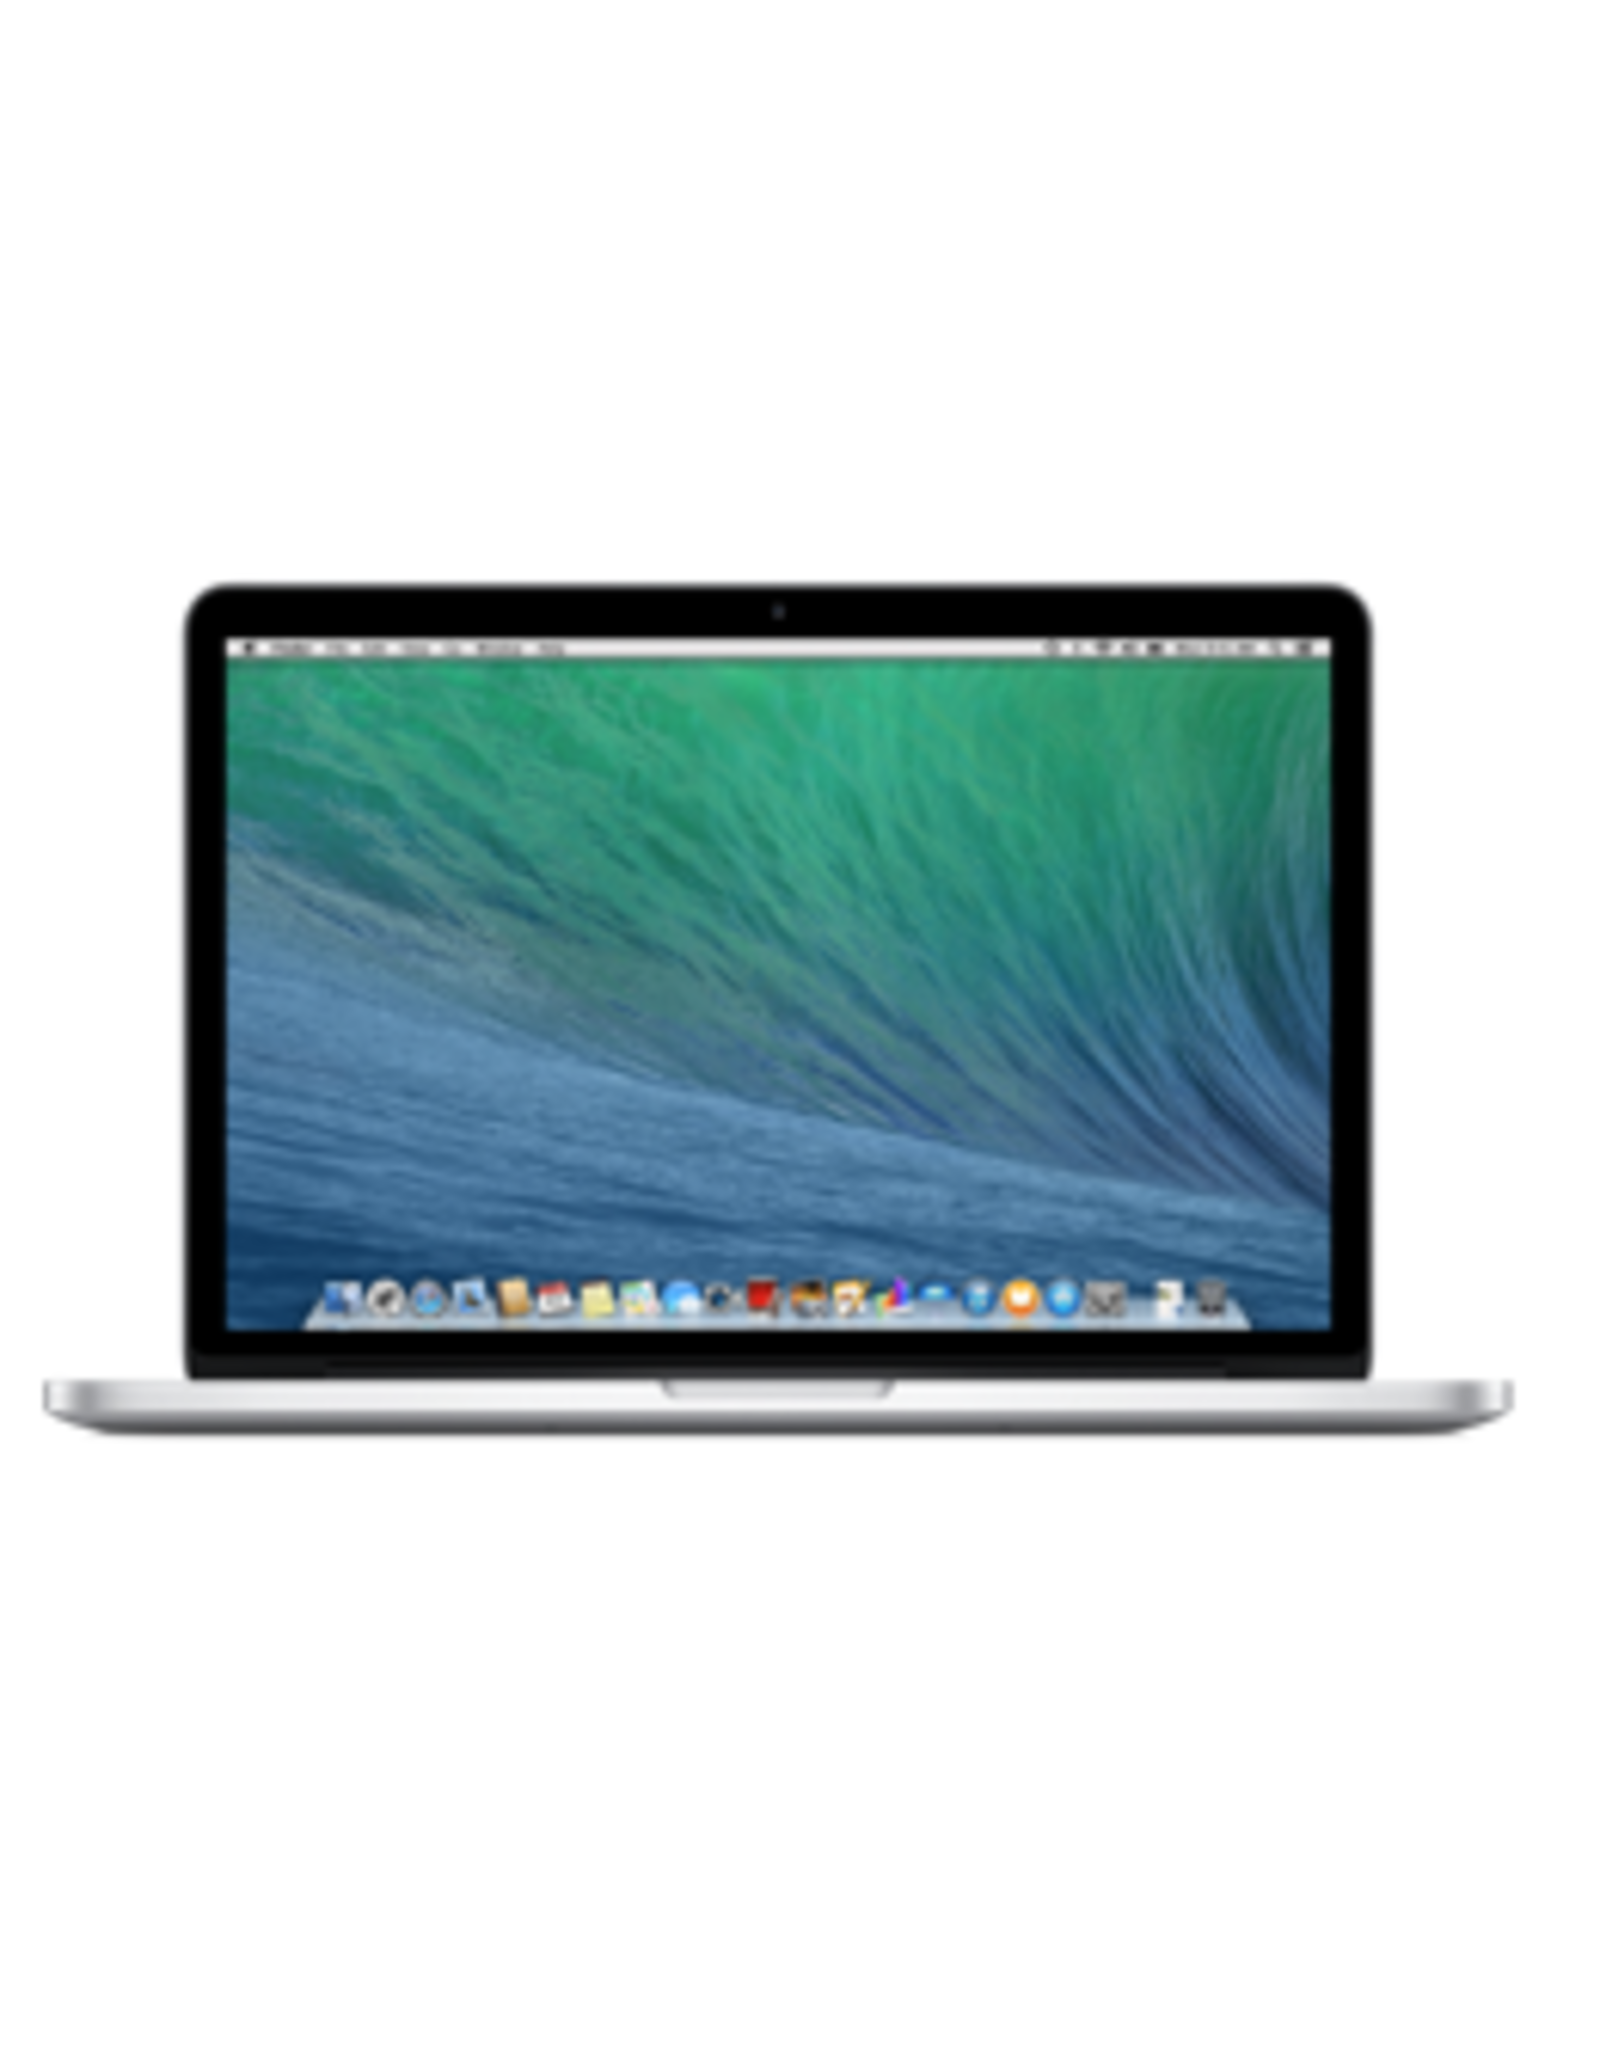 Apple MacBook Pro with Retina display 13-inch : 2.4GHz i5/ 4GB/ 128GB Flash/  Retina